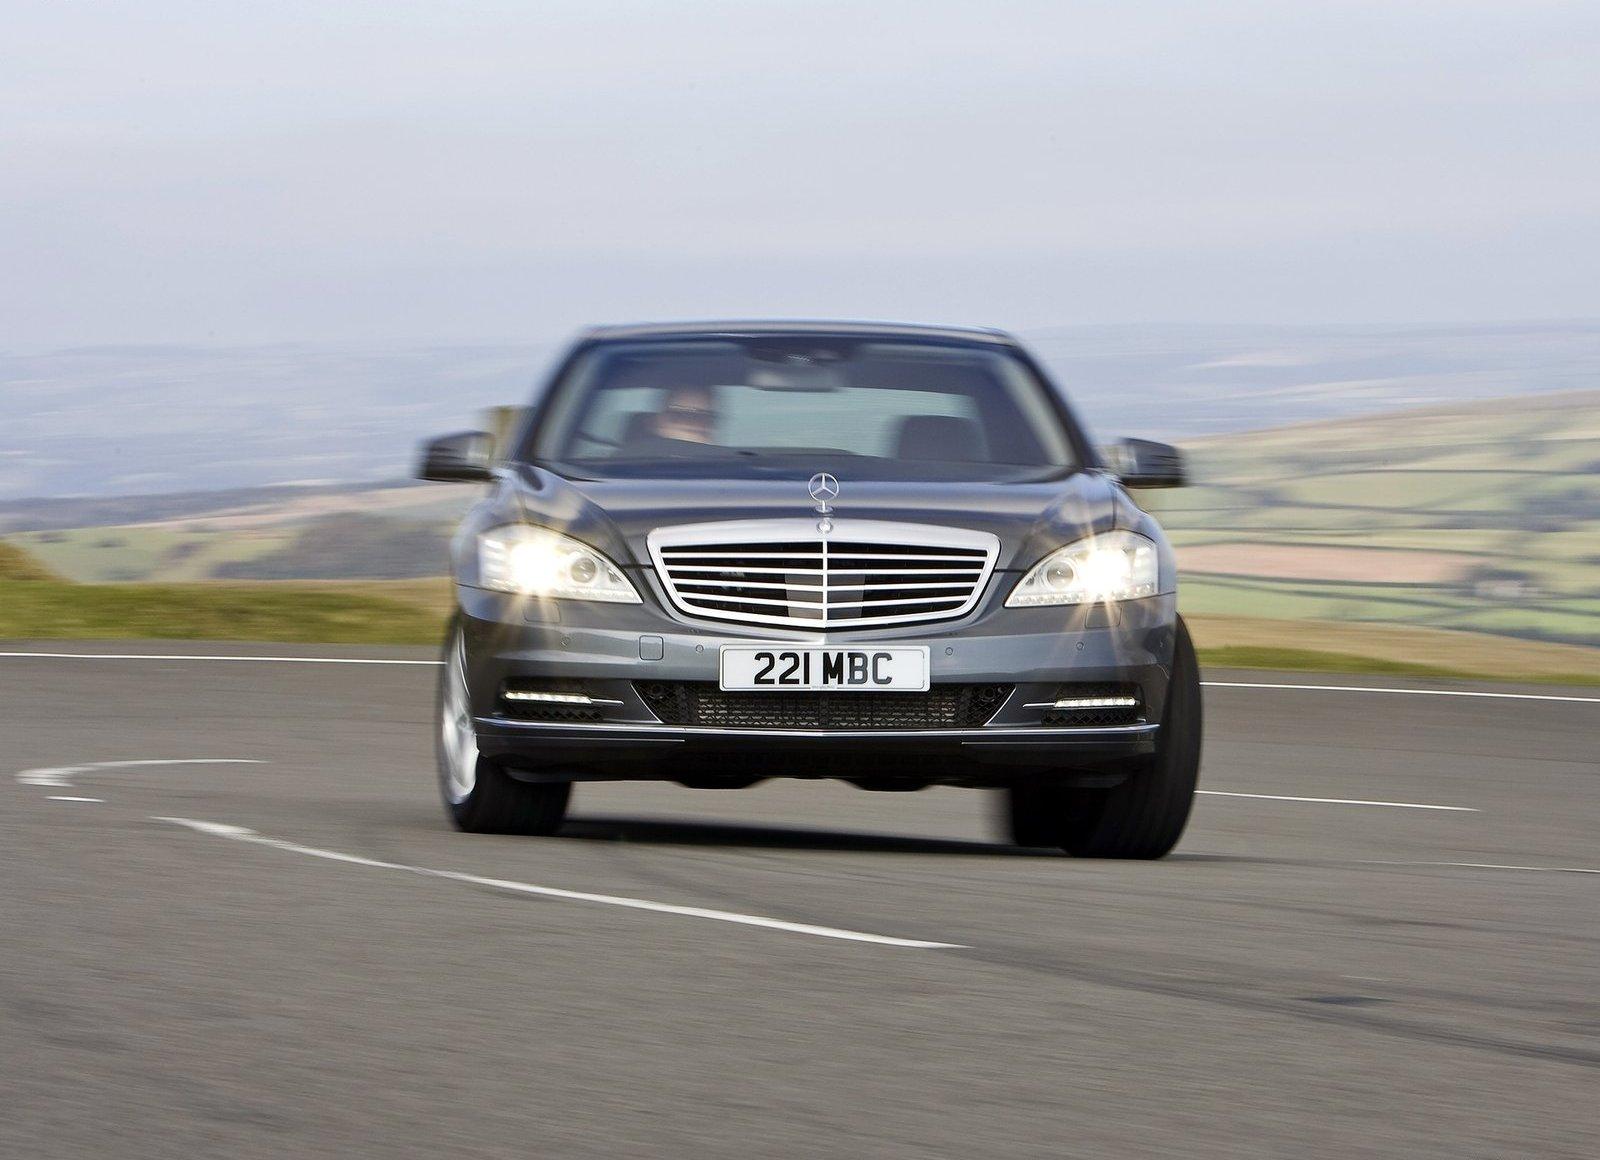 http://4.bp.blogspot.com/-Y2FG9SV_HVA/UUg7fPLn25I/AAAAAAAAALc/MJWG0tlMcWw/s1600/Mercedes-Benz-S-Class-1.jpg